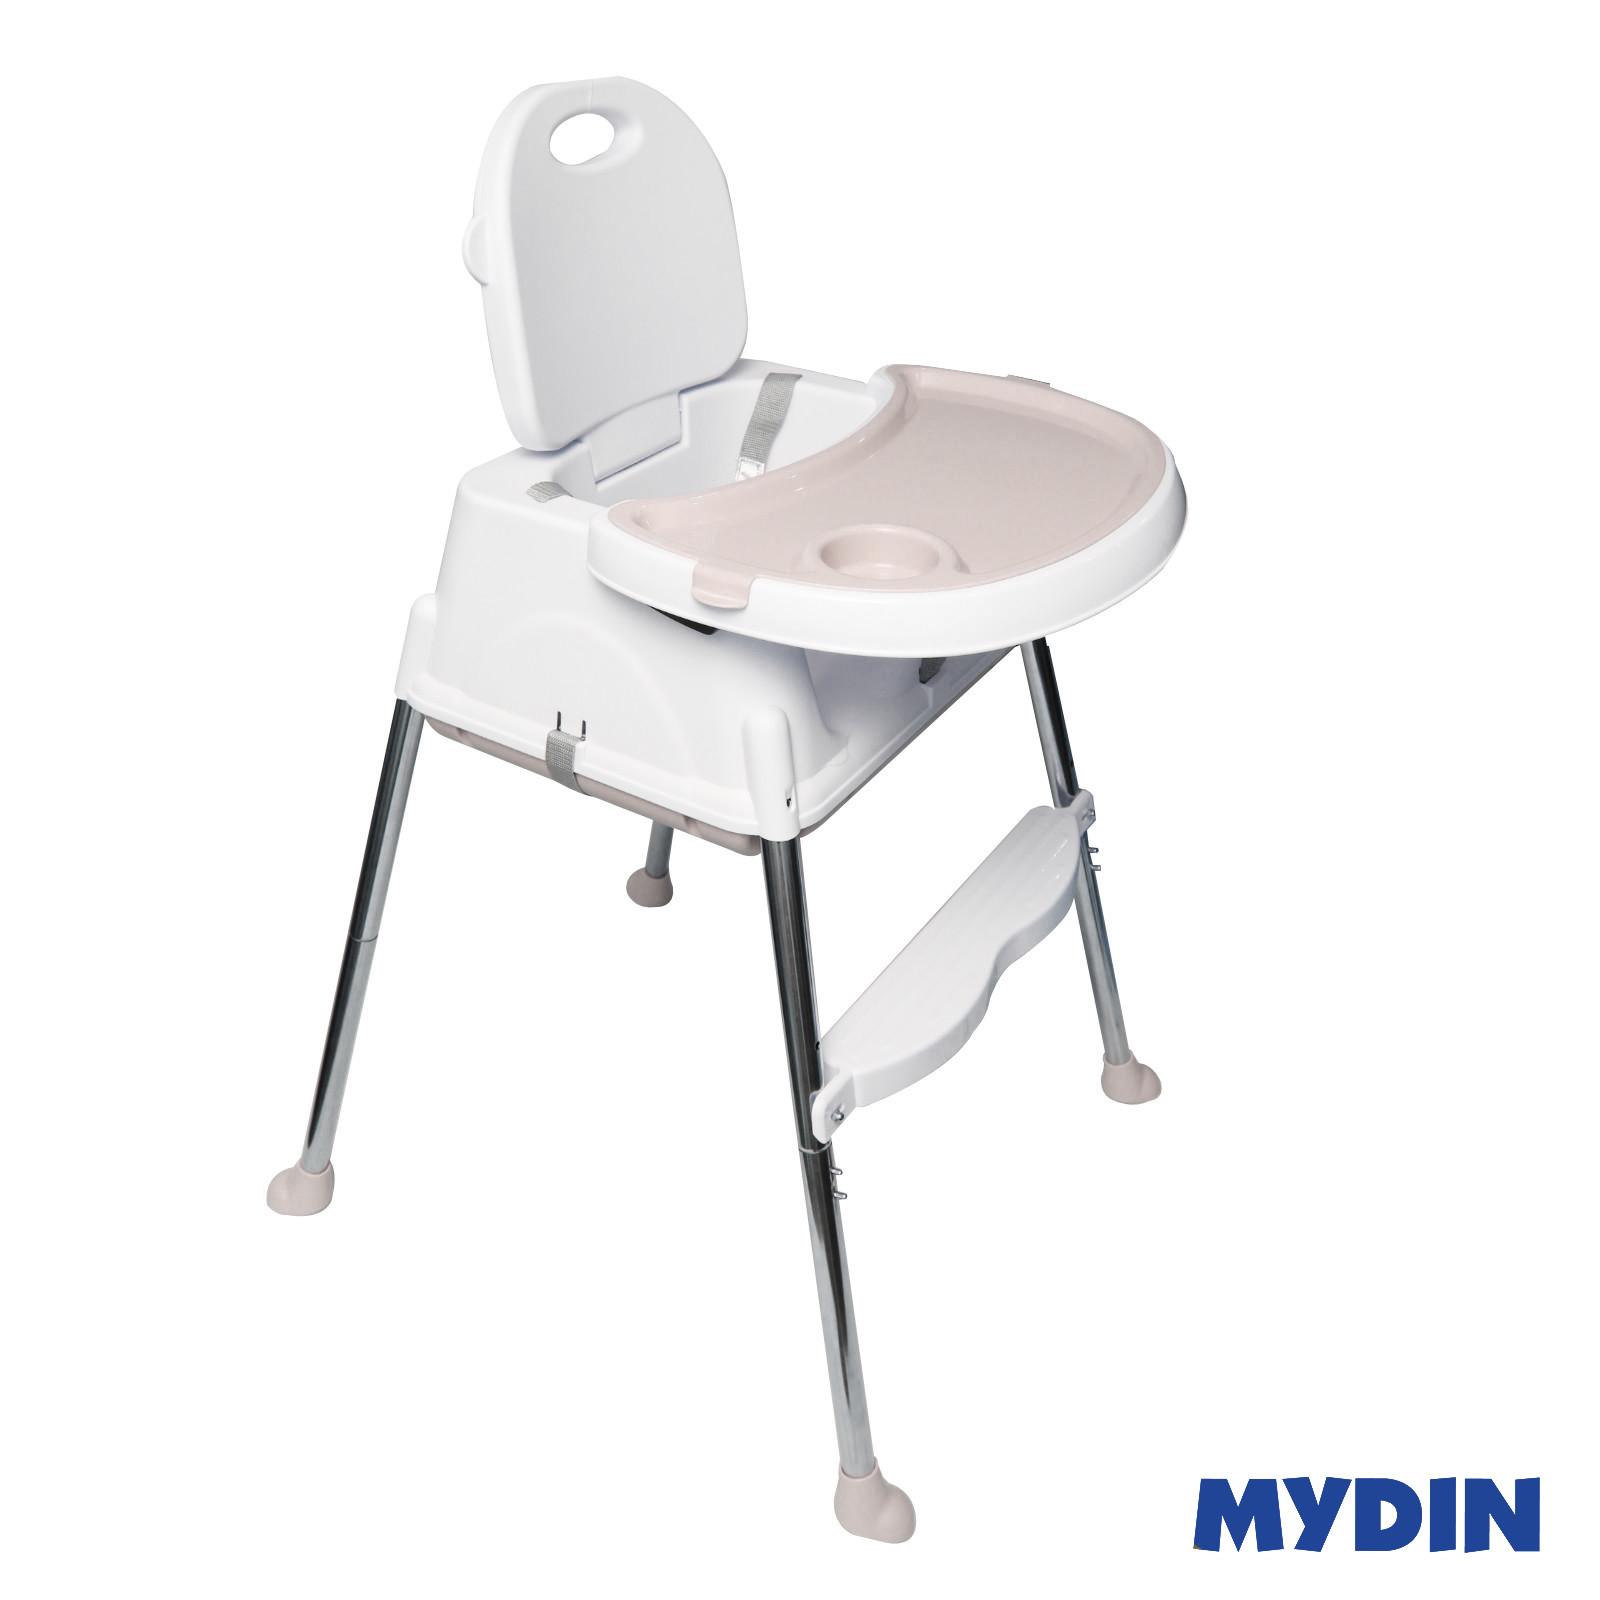 MYBB Portable Multi Function Foldable Baby Feeding Dining ChairWhite 0820YW-HE01C